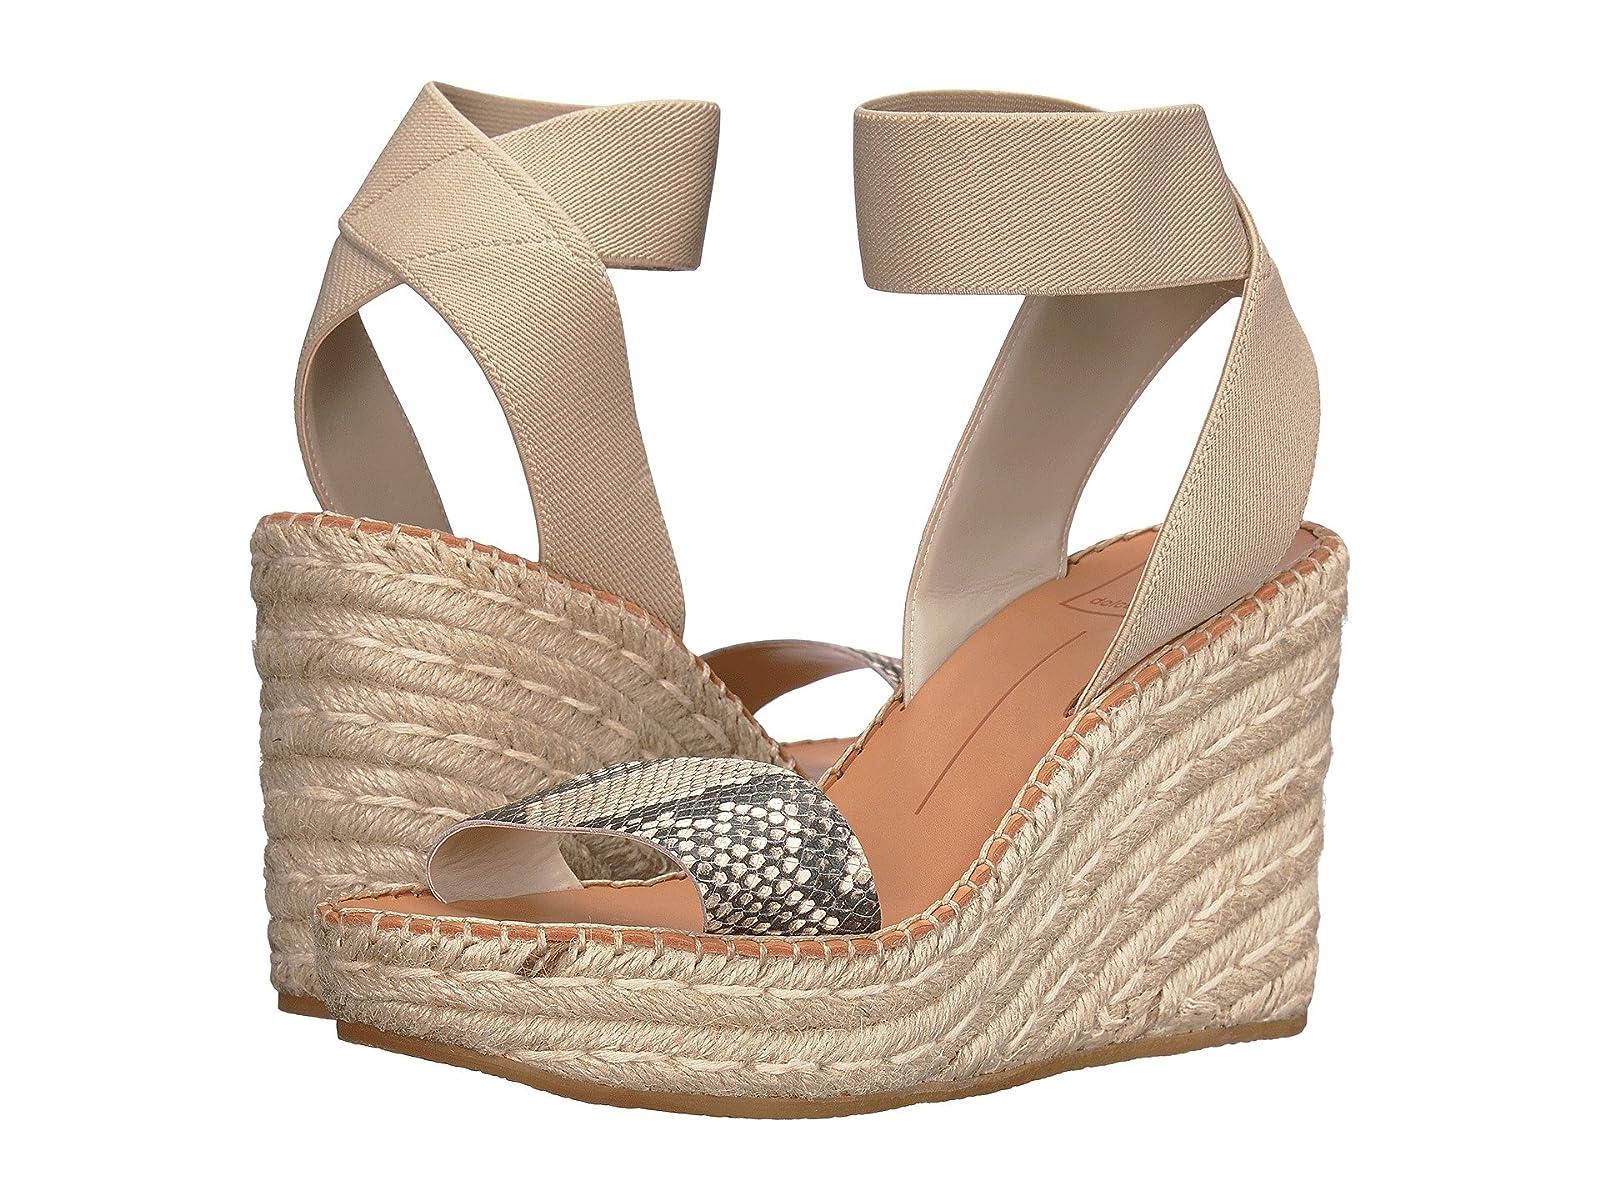 Dolce Vita PavlinAtmospheric grades have affordable shoes